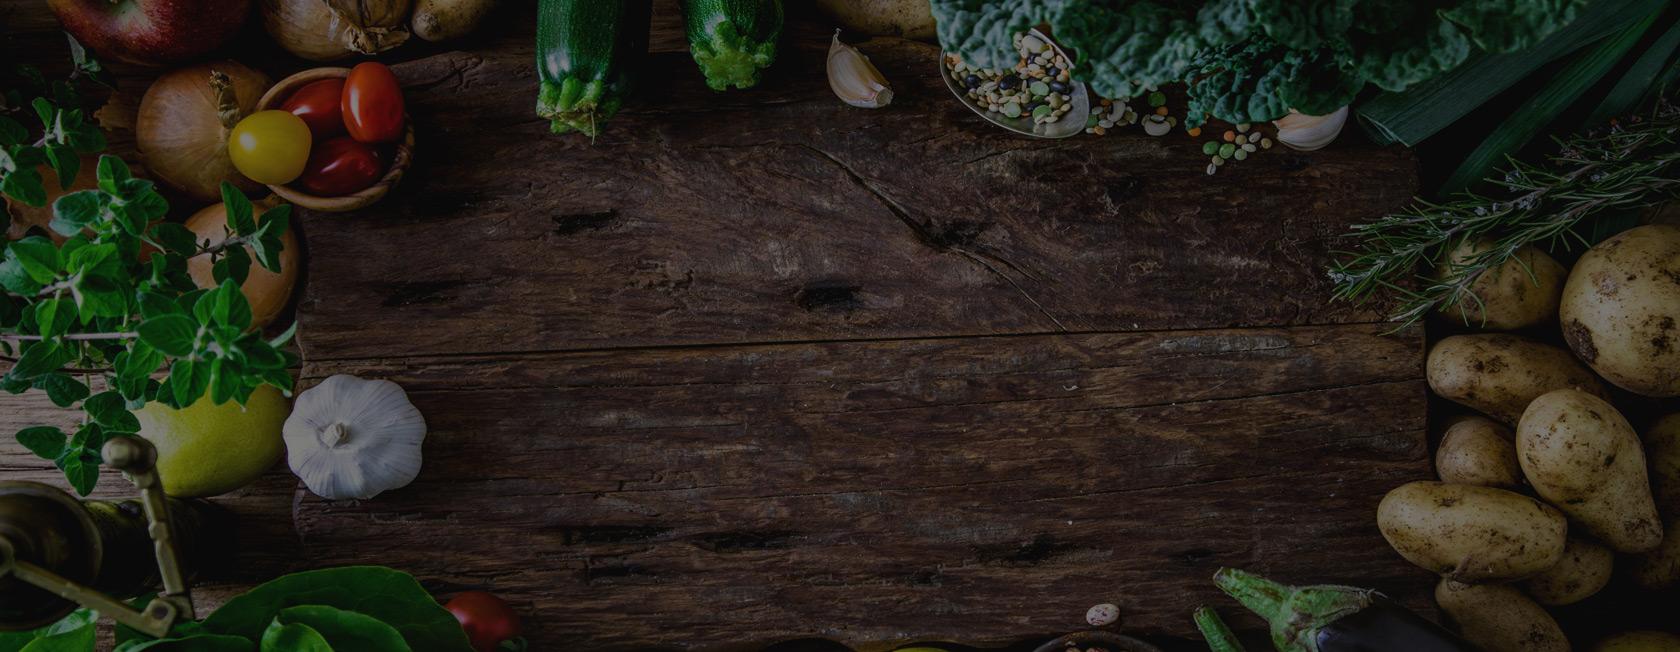 vegfruit-import-warzyw-owocow